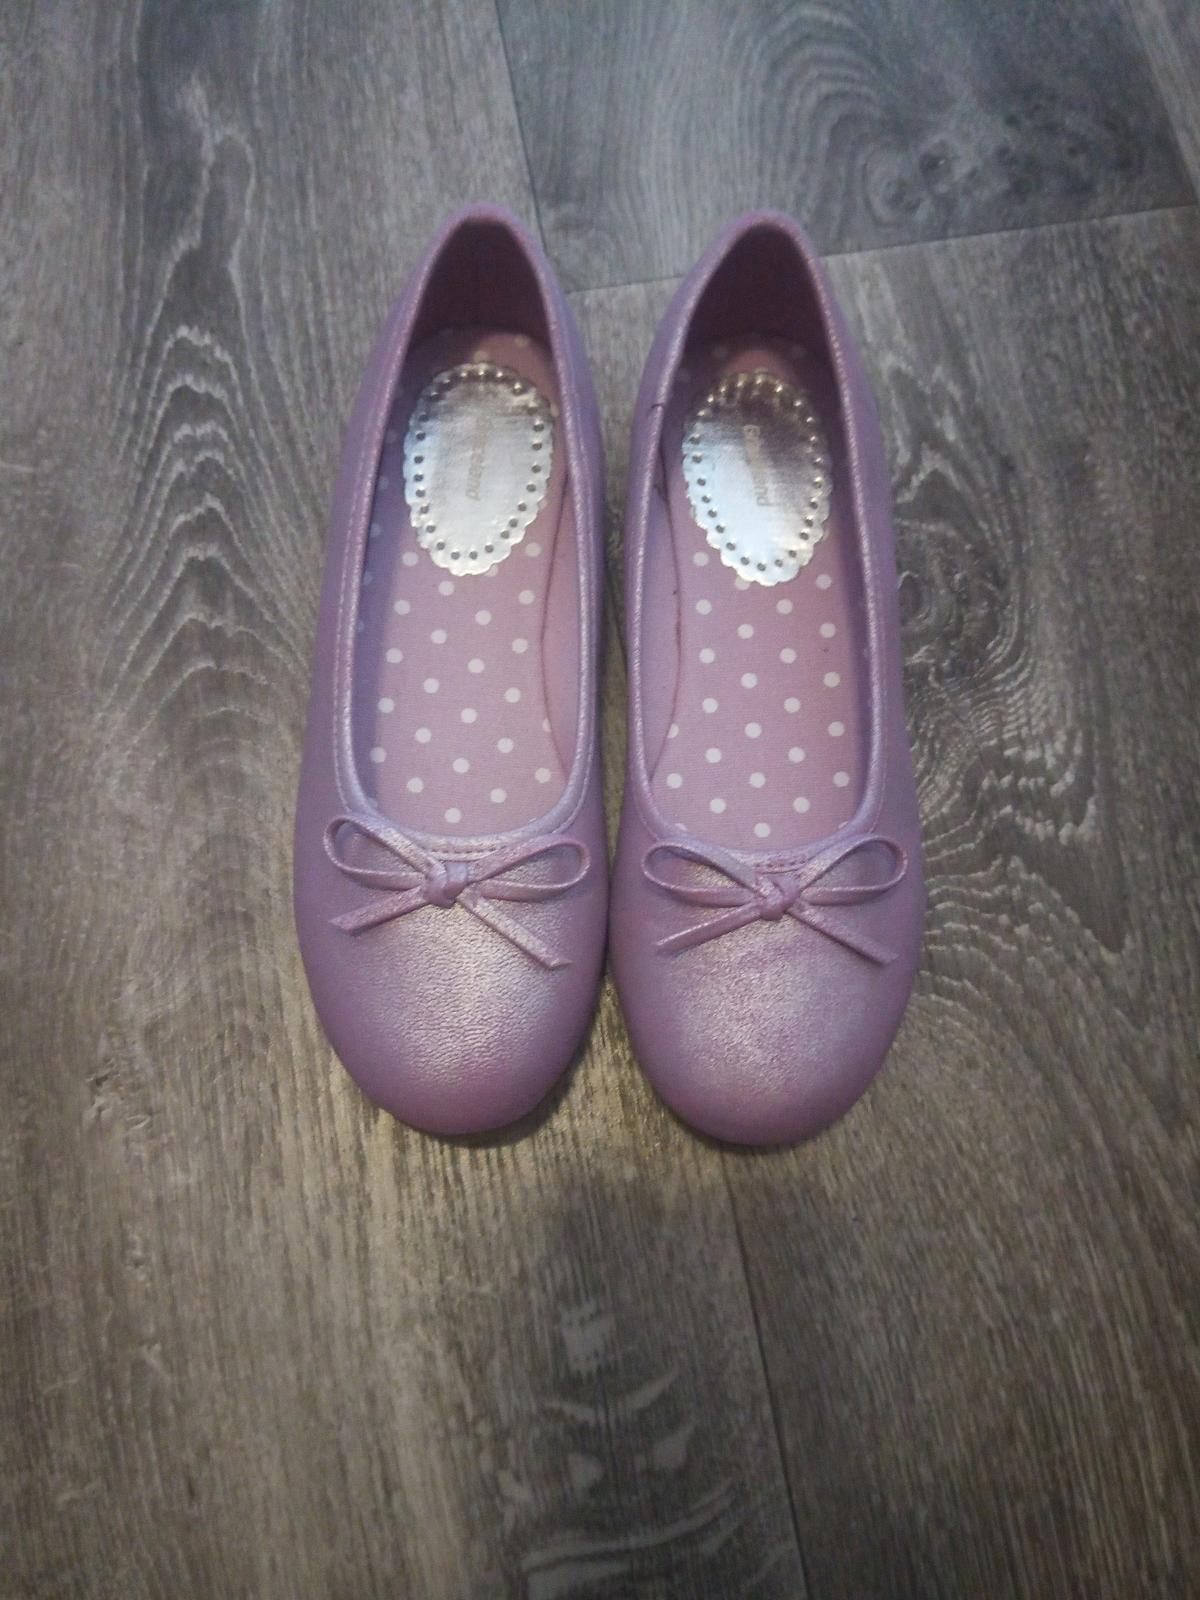 Růžovo-fialové balerínky - Obrázek č. 1